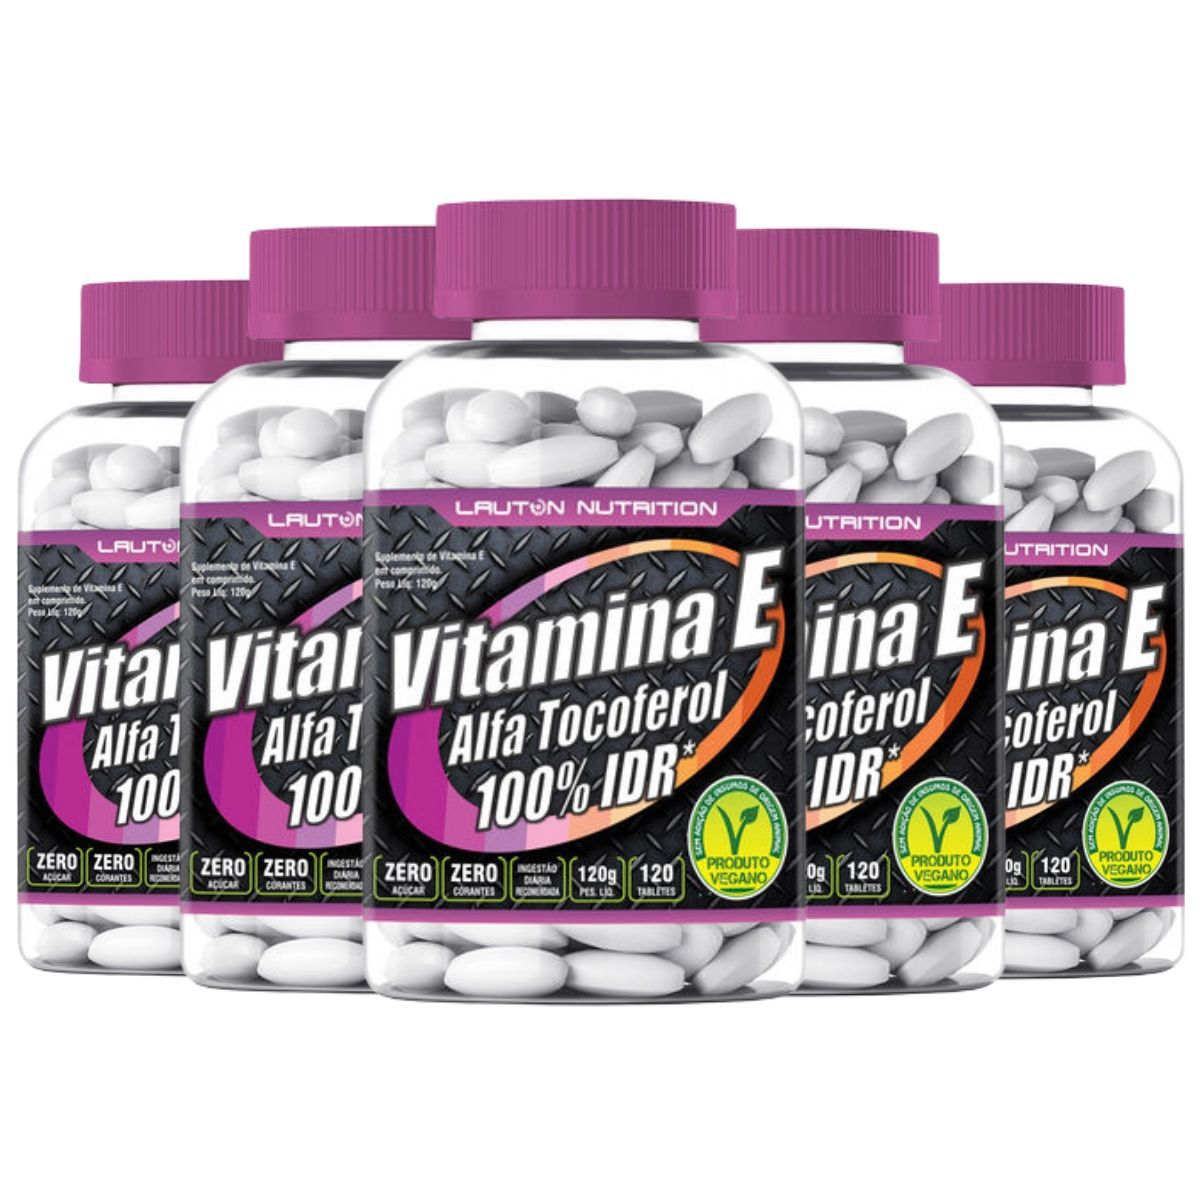 Kit 5 Vitamina E Alfa Tocoferol 100% IDR 1000mg 120 Tabs - Lauton Nutrition